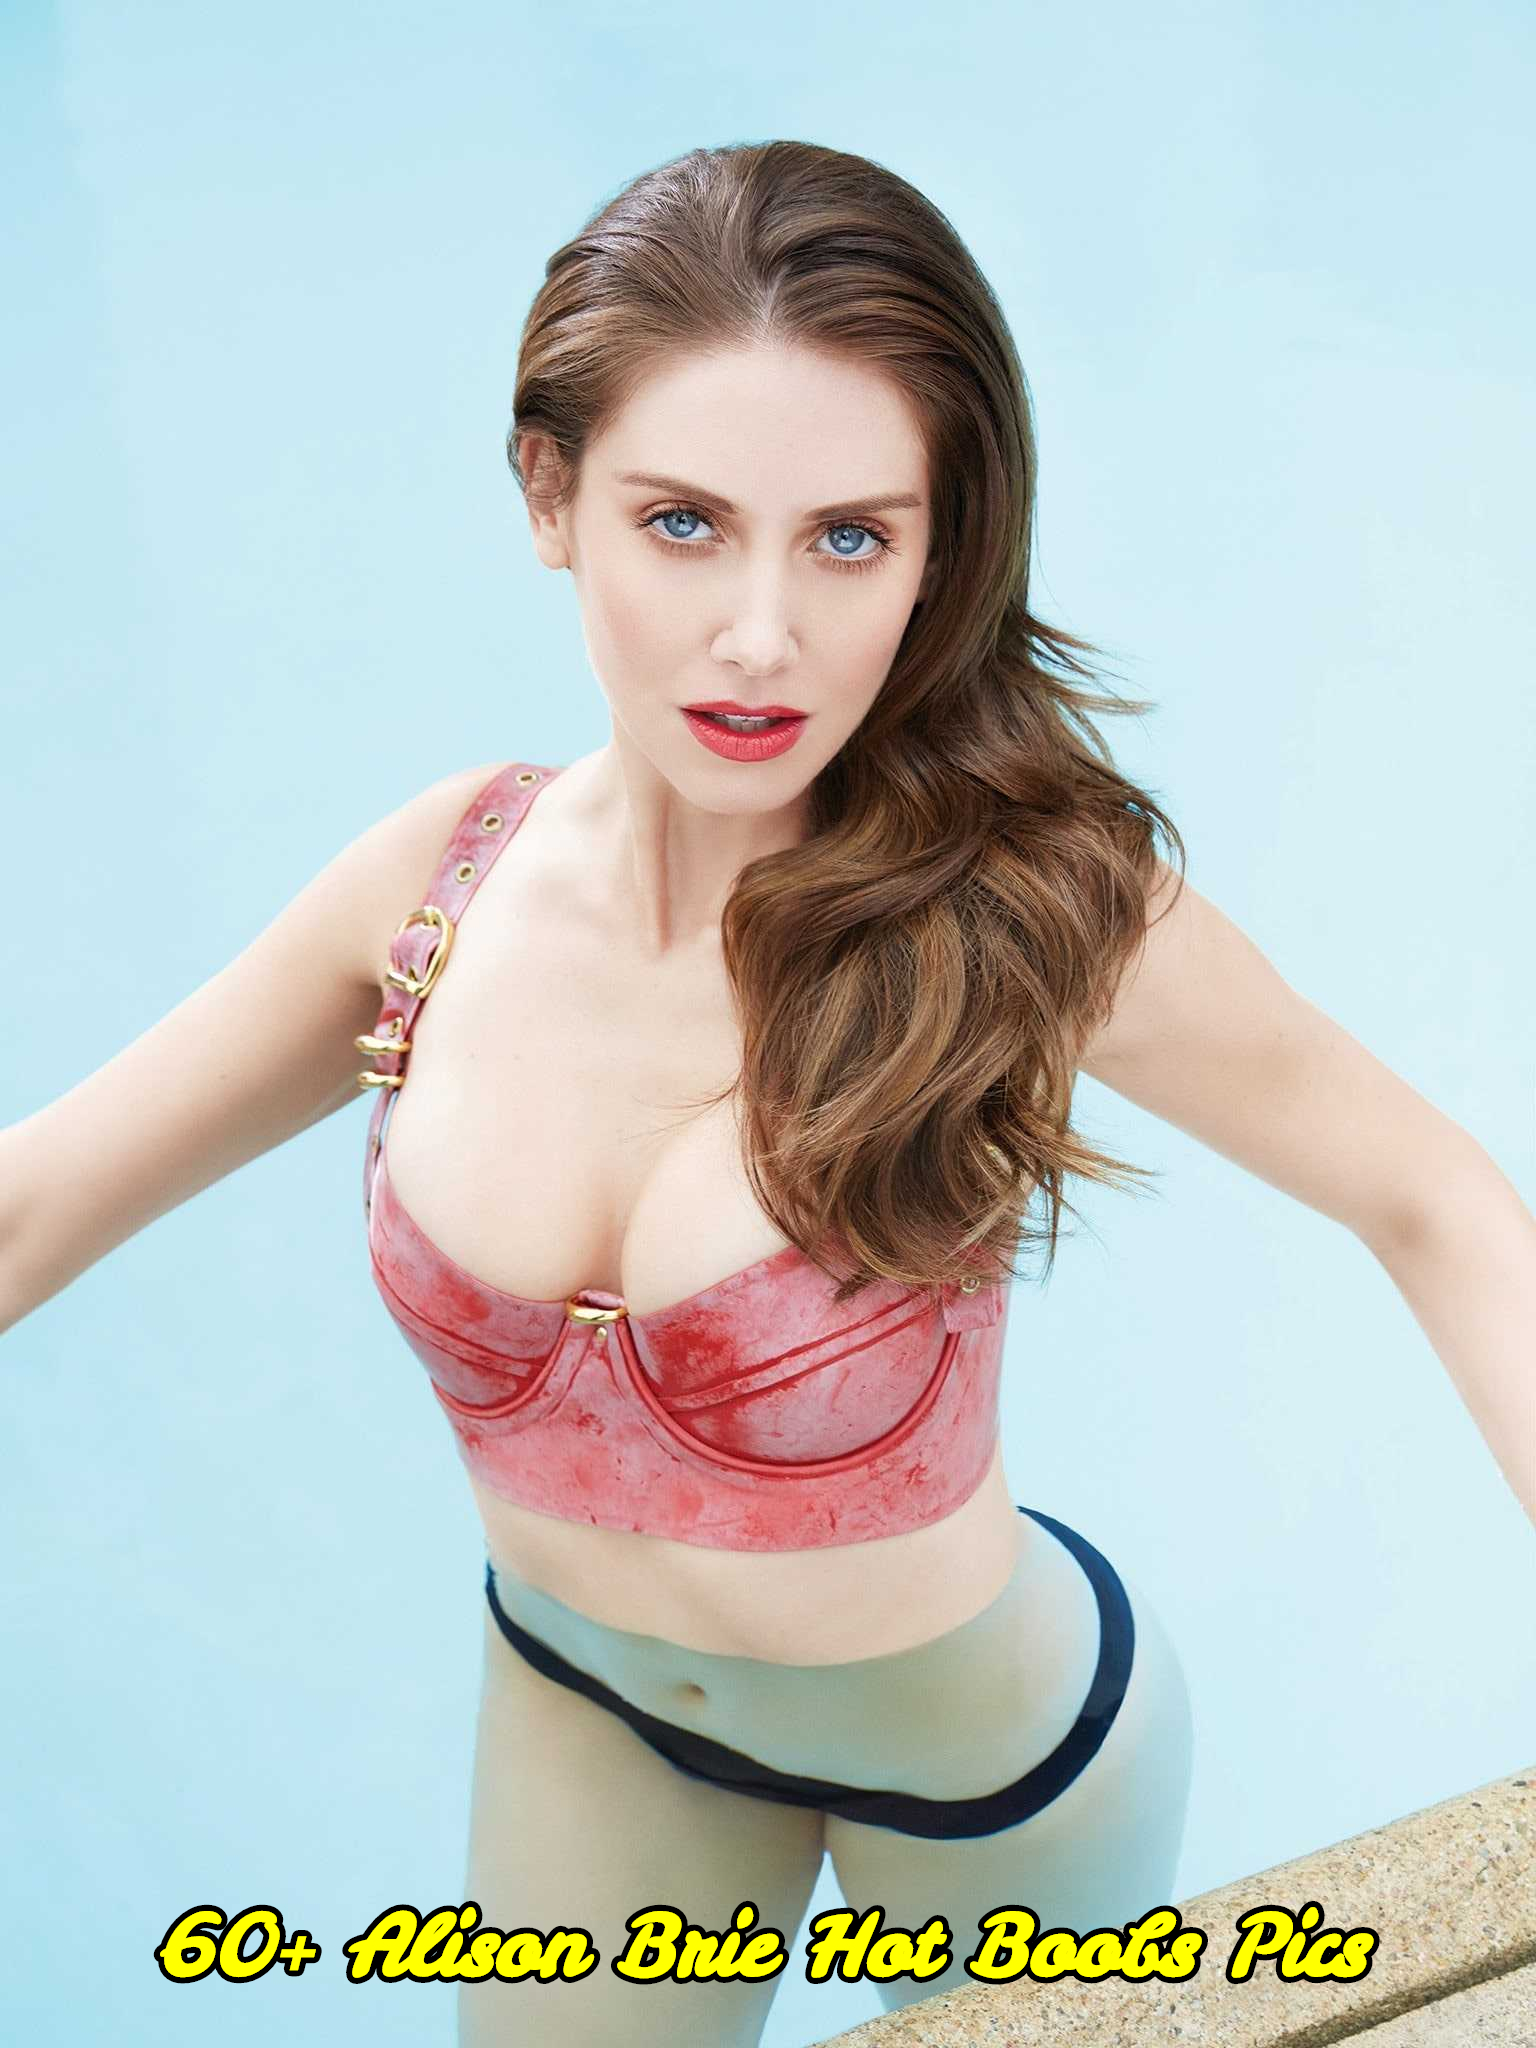 Alison Brie hot boobs pics